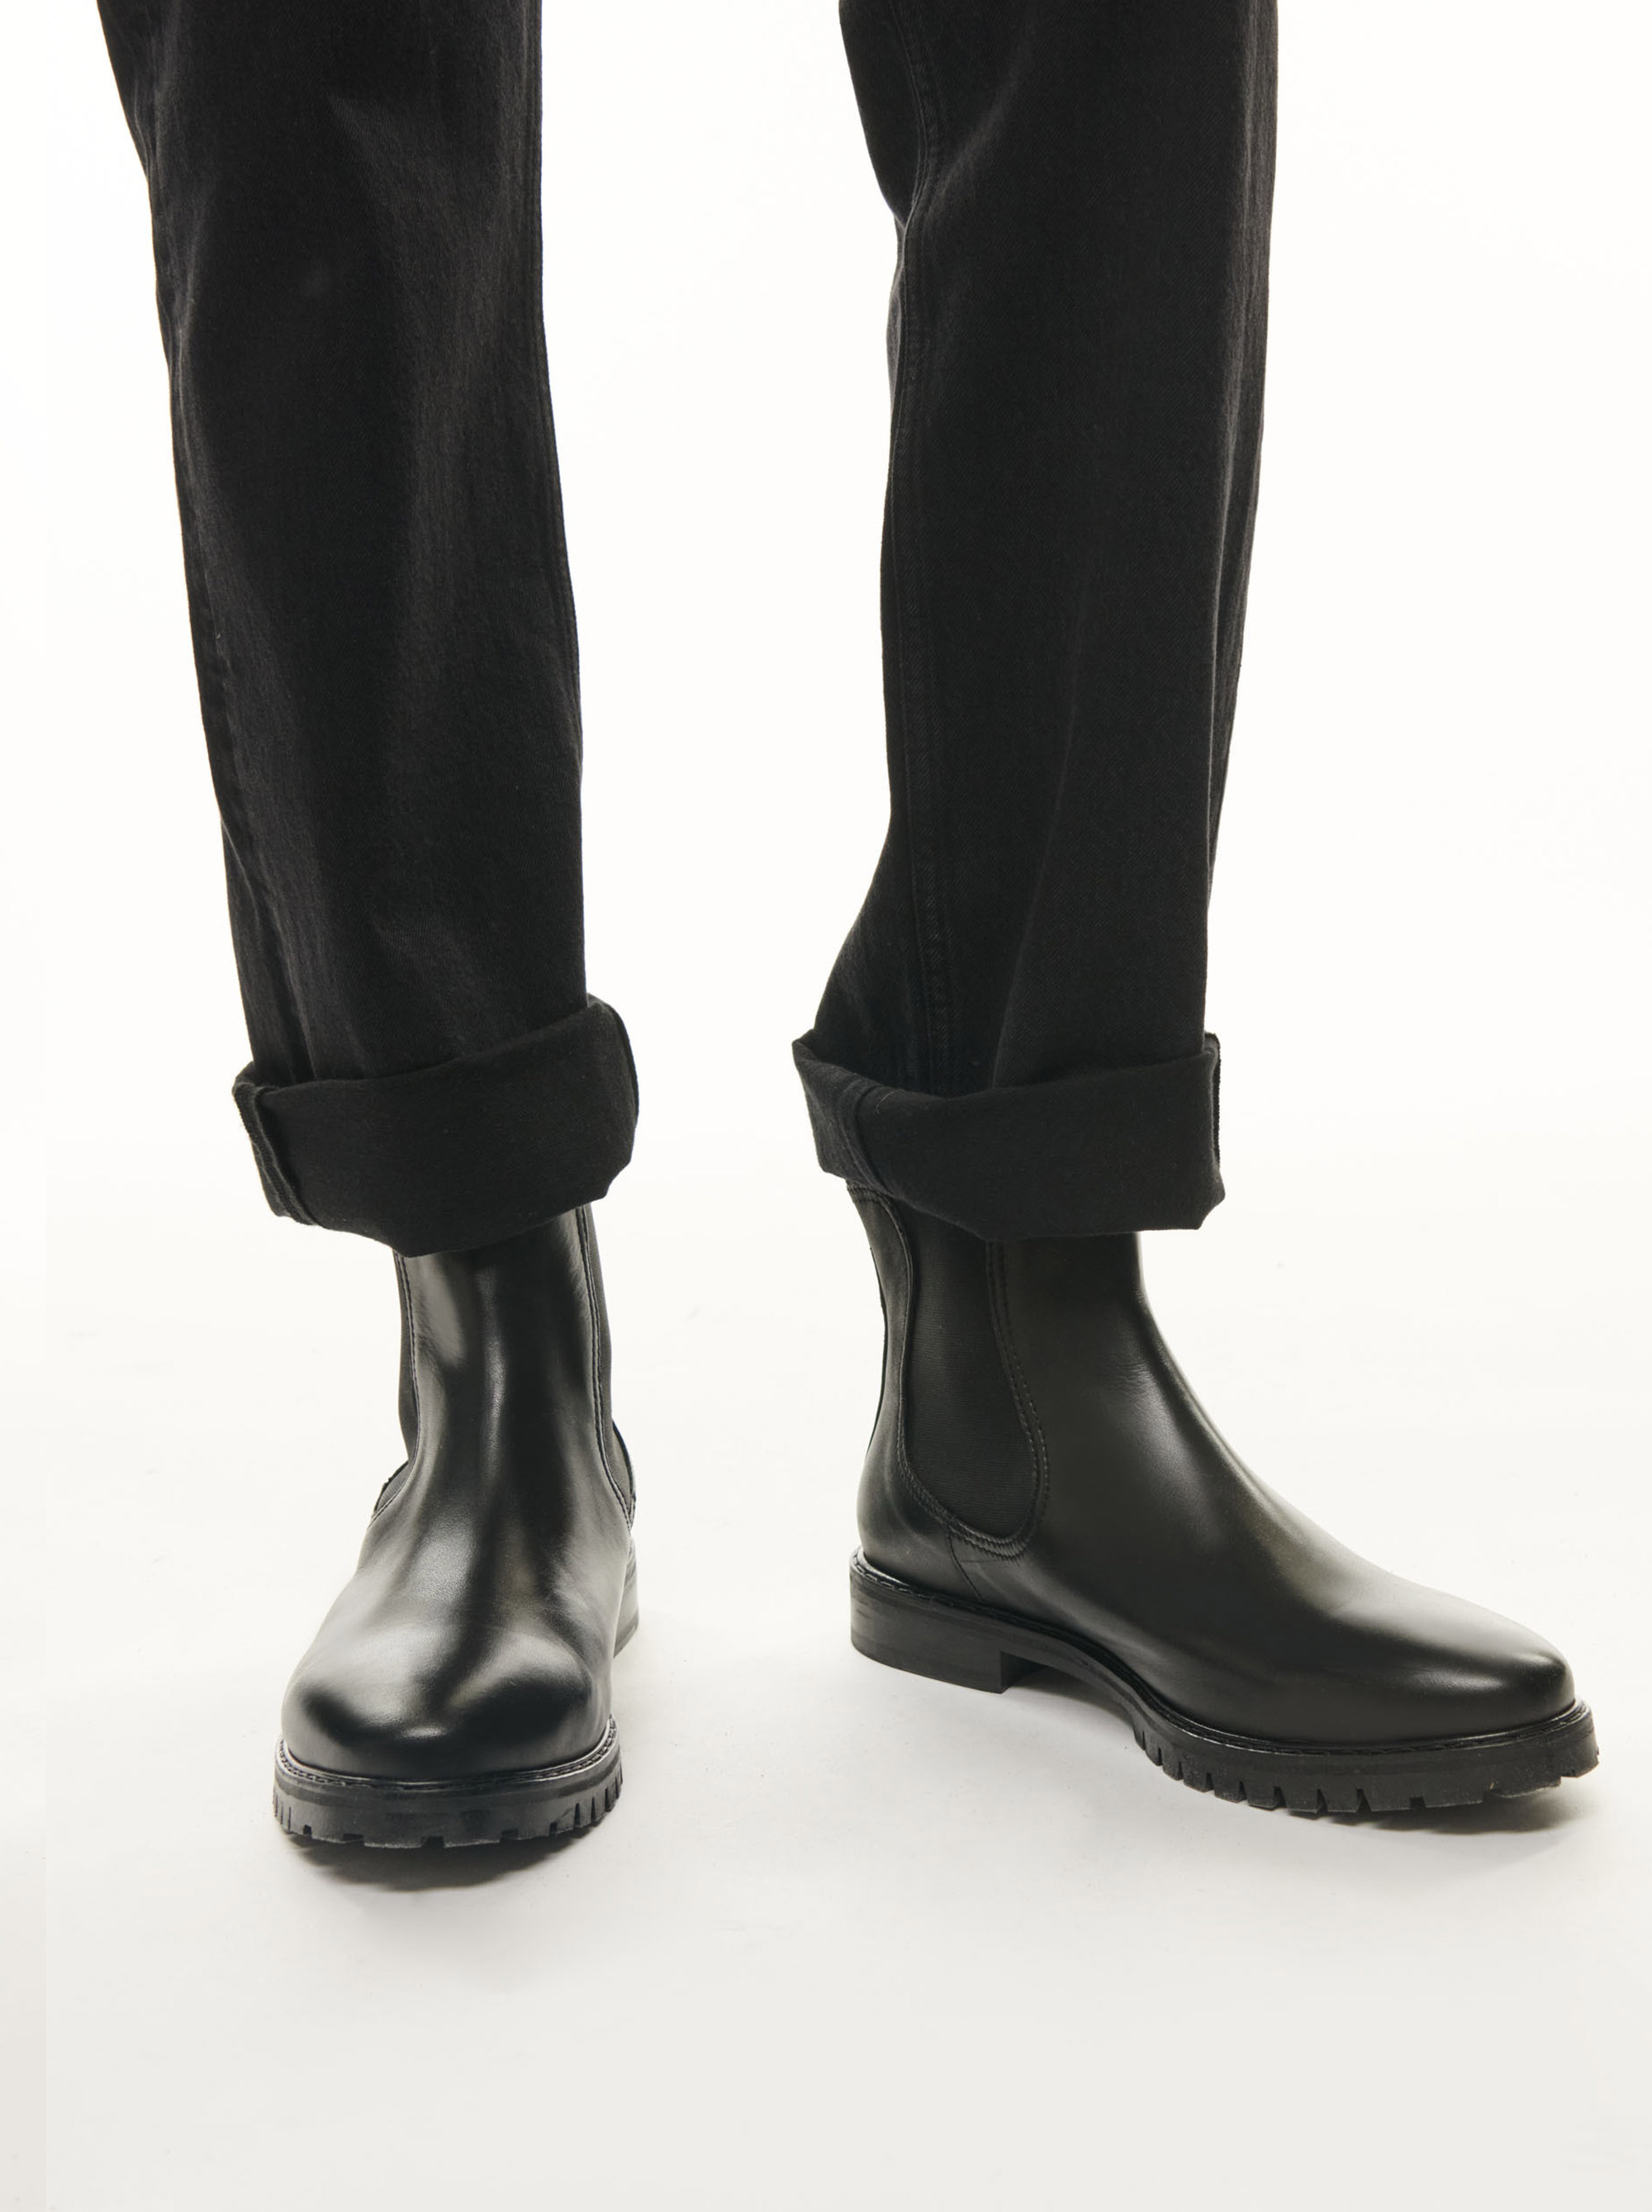 Teym - The Chelsea Boot - Black - 16